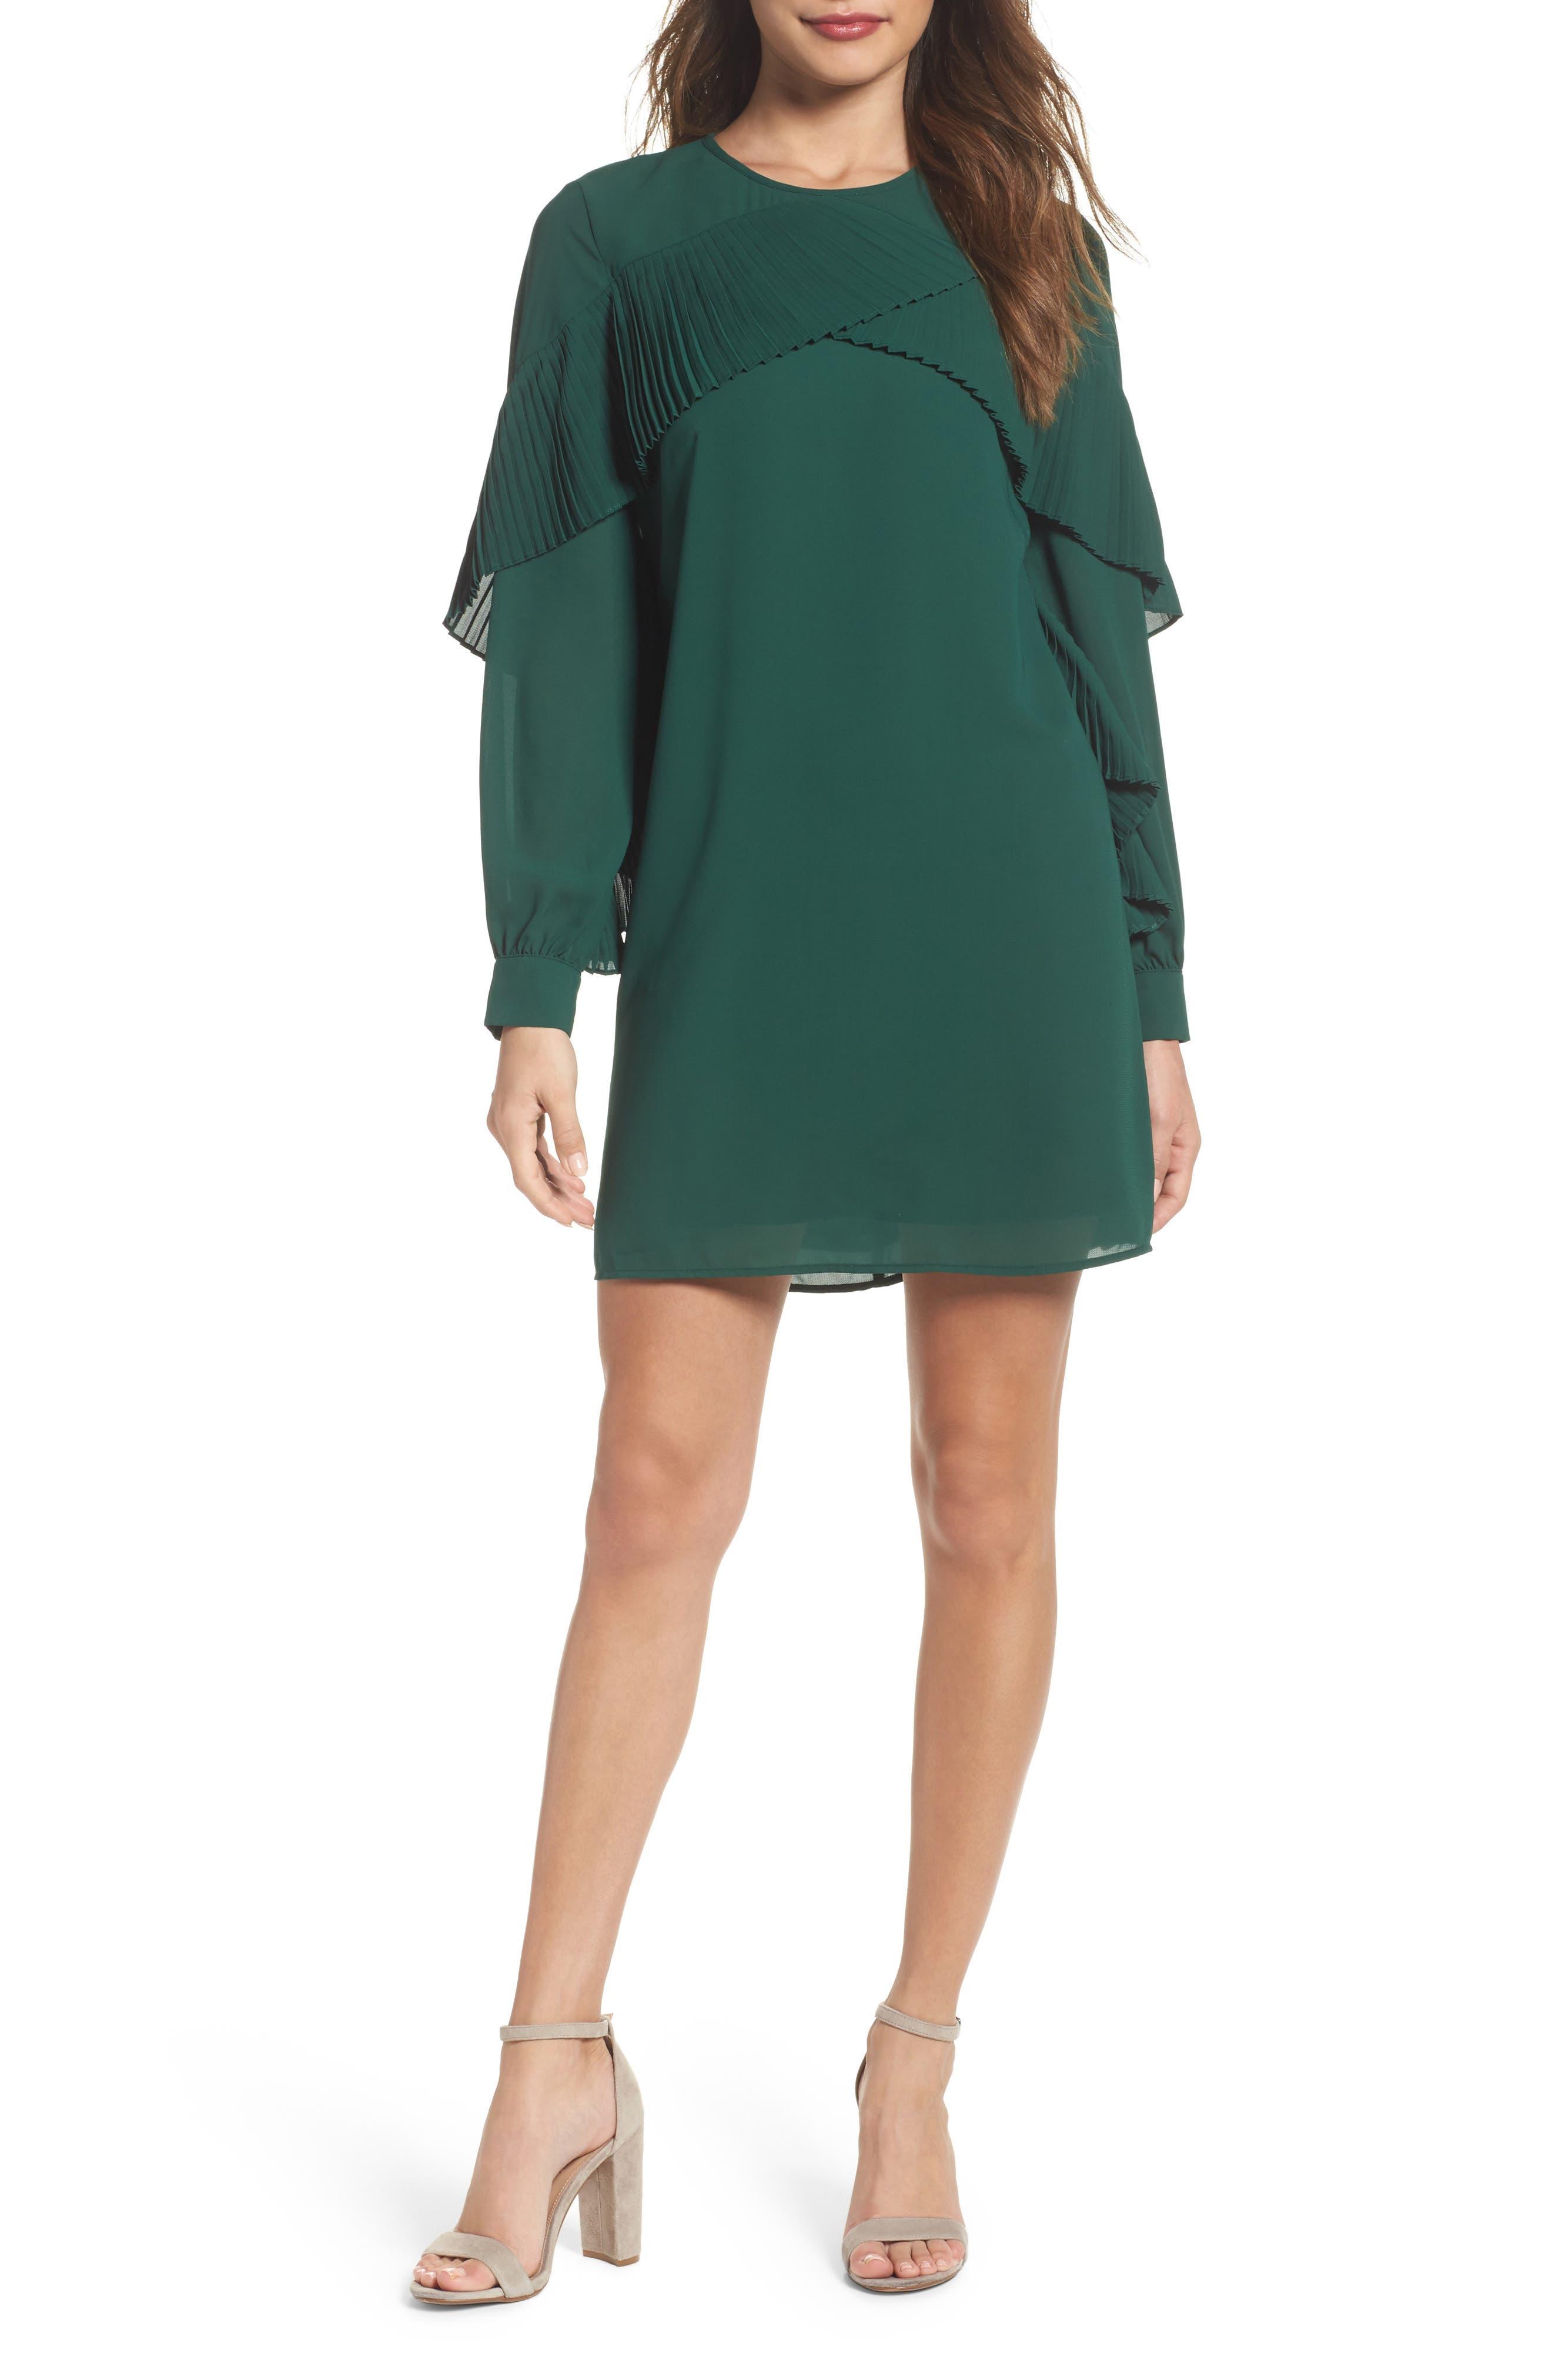 Ruffle Shift Dress,                             Main thumbnail 1, color,                             Green Evergreen